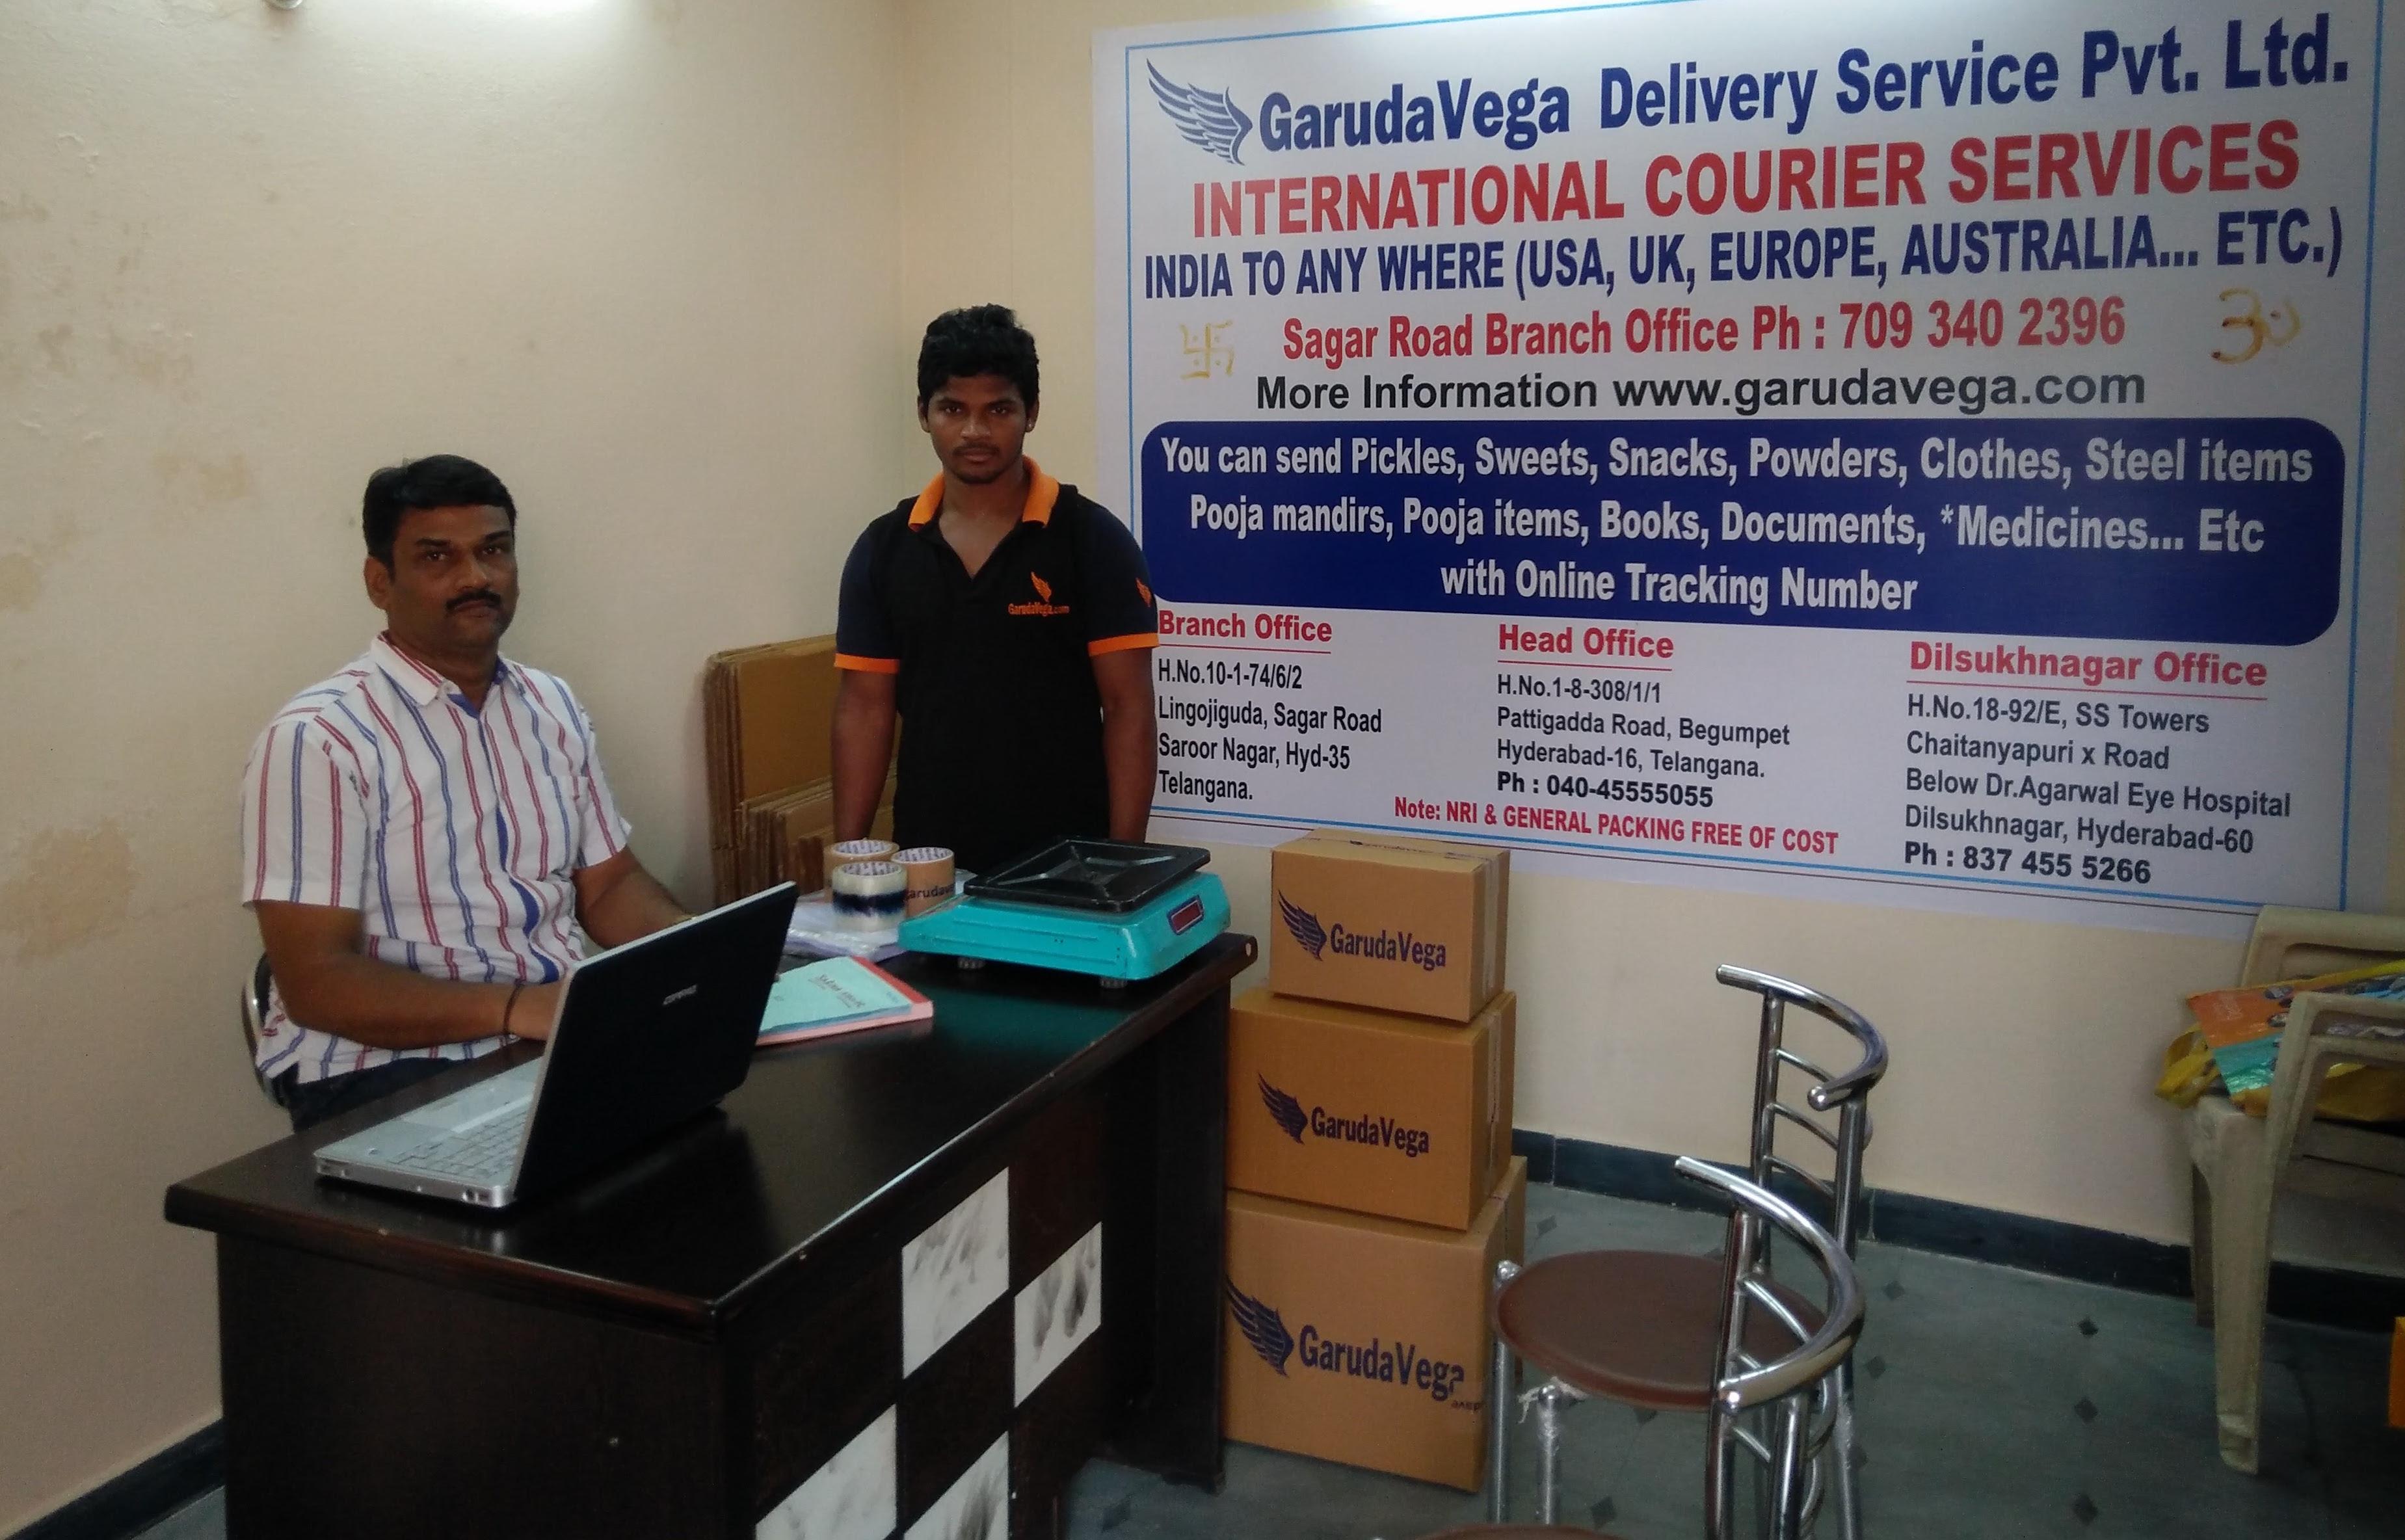 Karmanghat - Sagar Road - Garudavega Courier Services